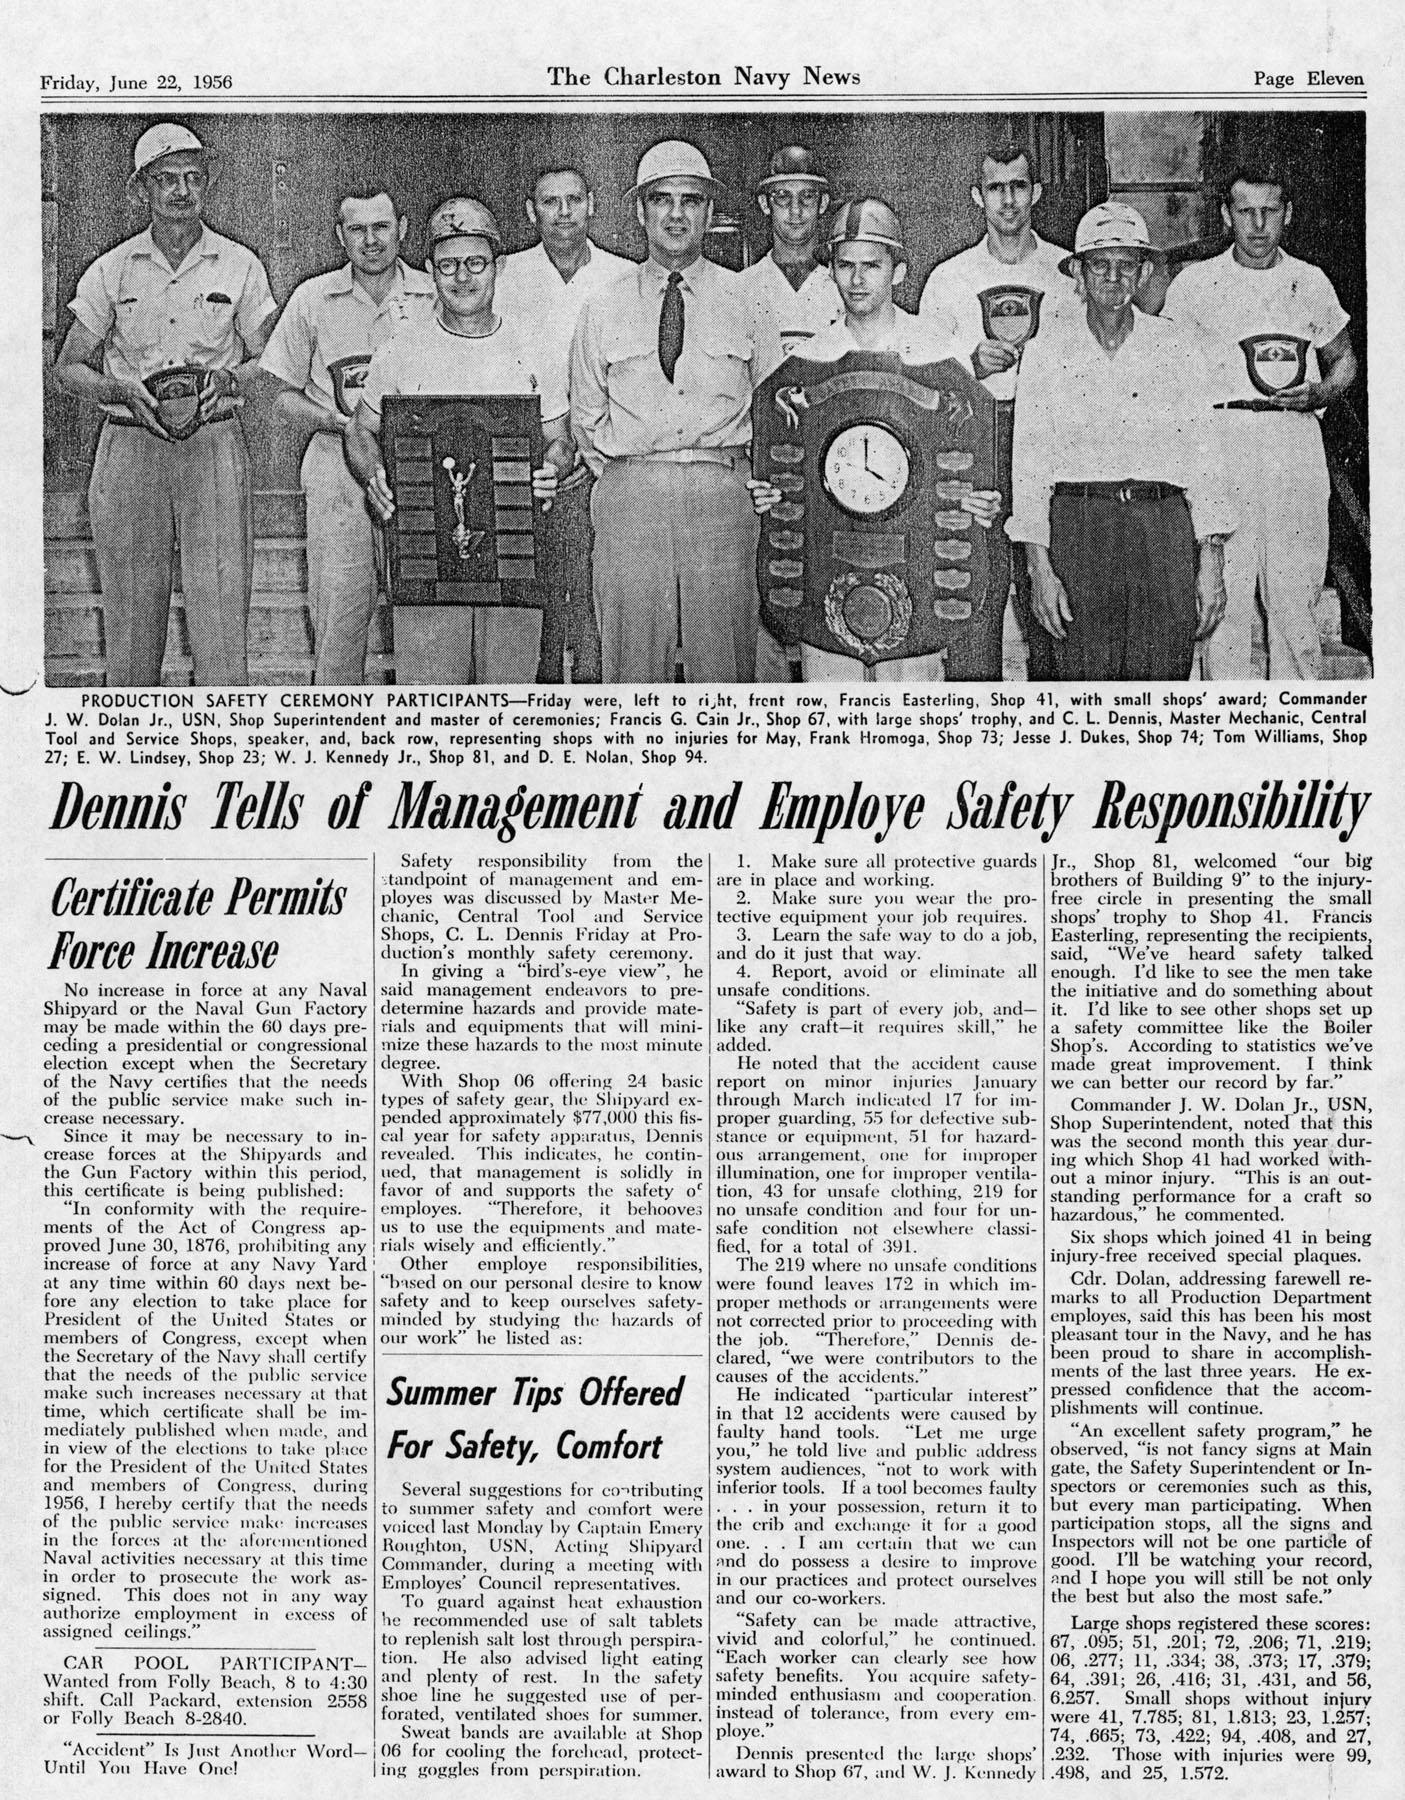 The Charleston Navy News, Volume 14, Edition 24, page xi